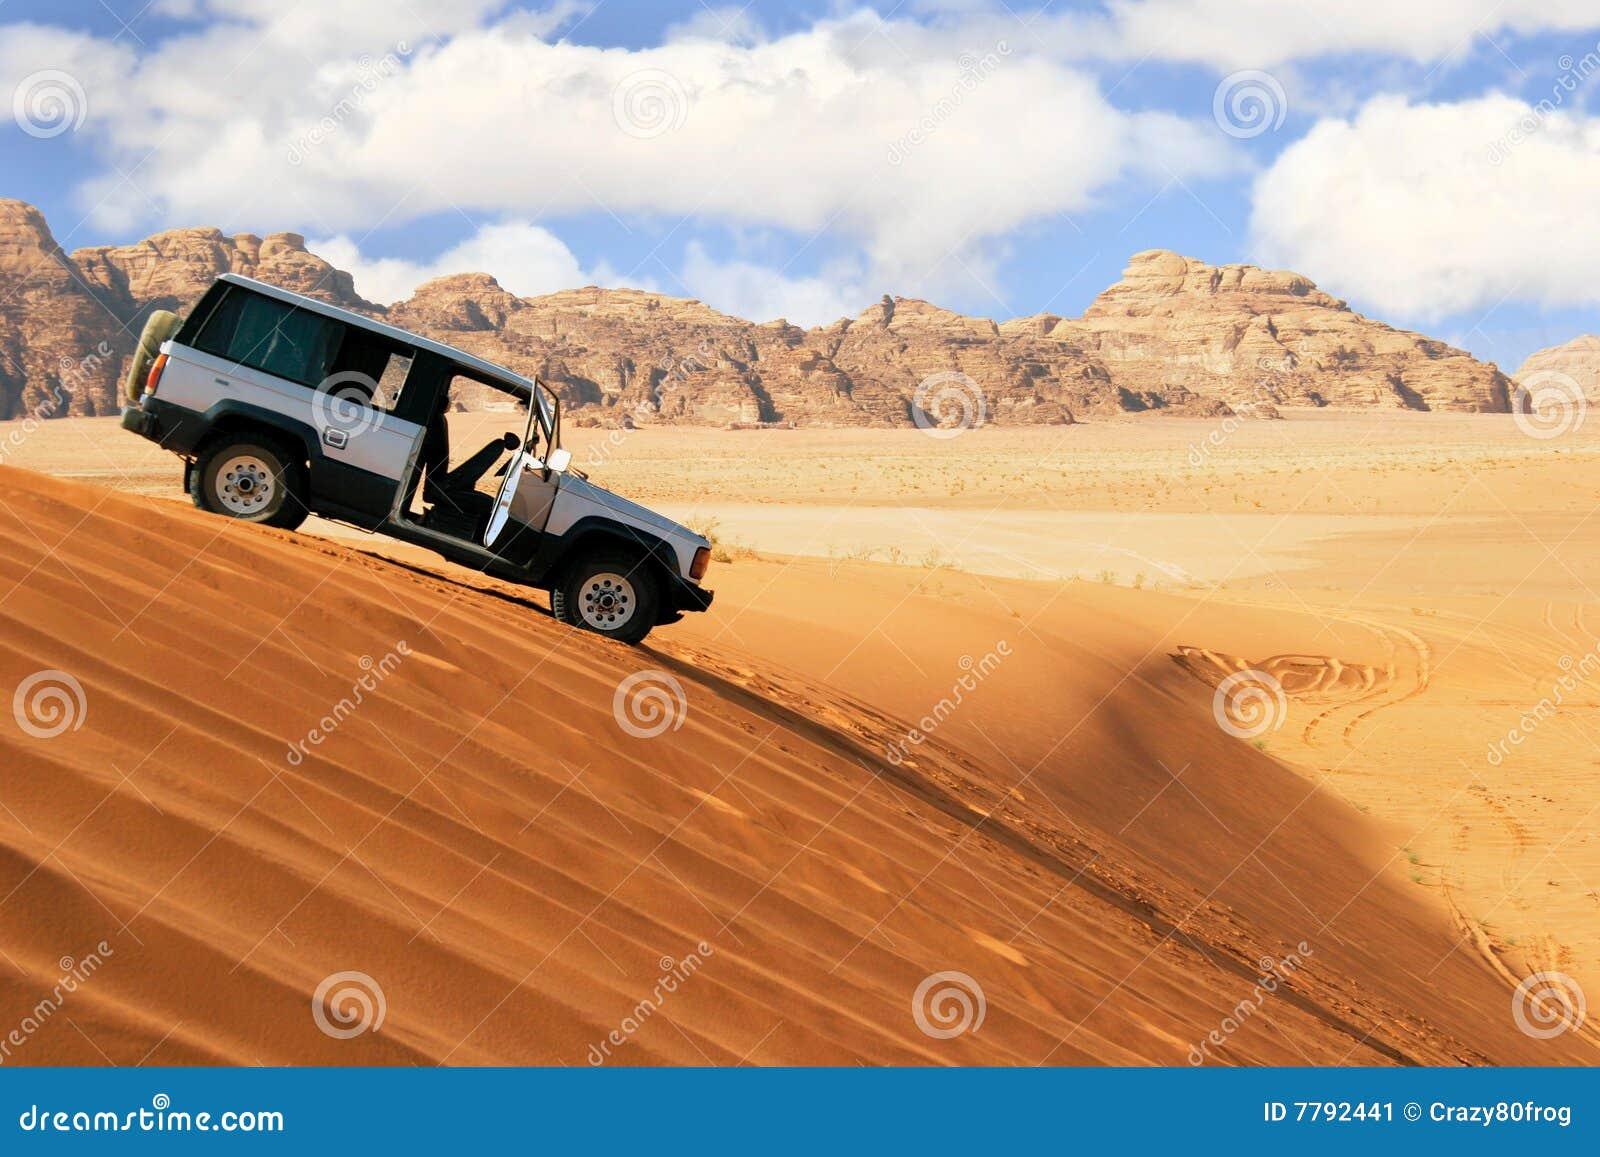 Jeep car in desert